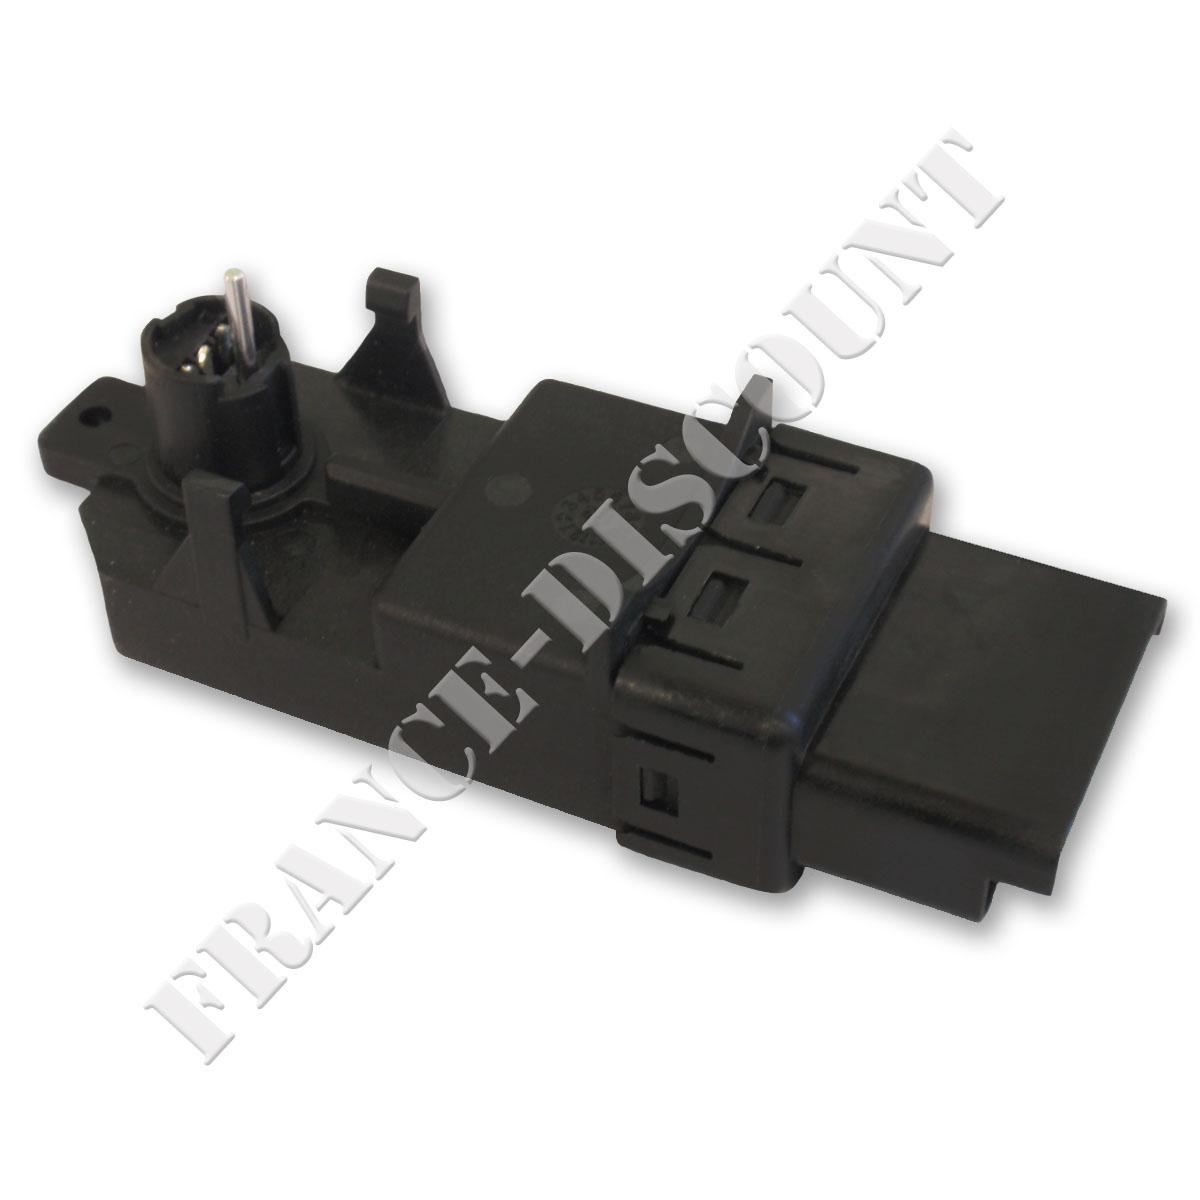 modulo temic sistemi confort alzacristalli elettrico renault megane 2 ii ebay. Black Bedroom Furniture Sets. Home Design Ideas